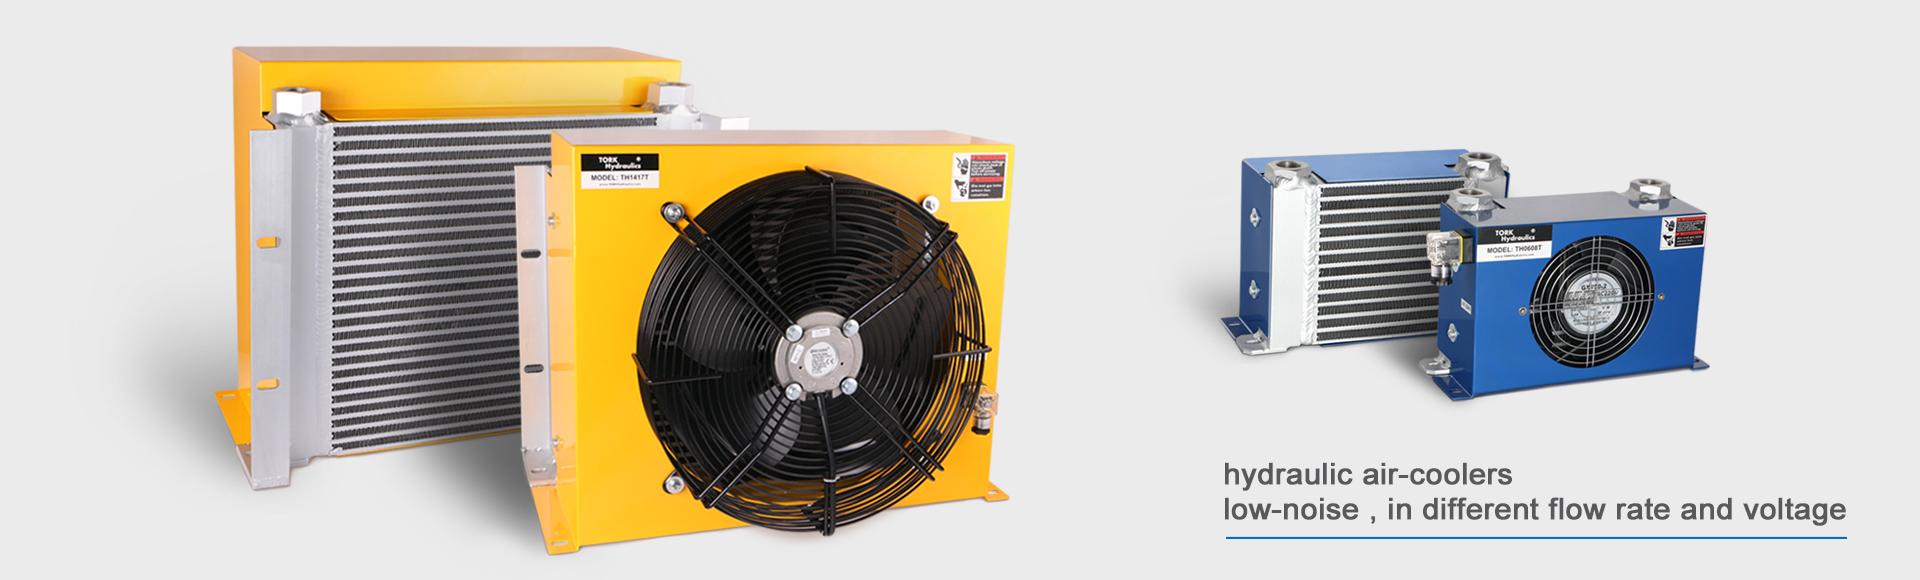 slider_torkhydraulics-air-coolers